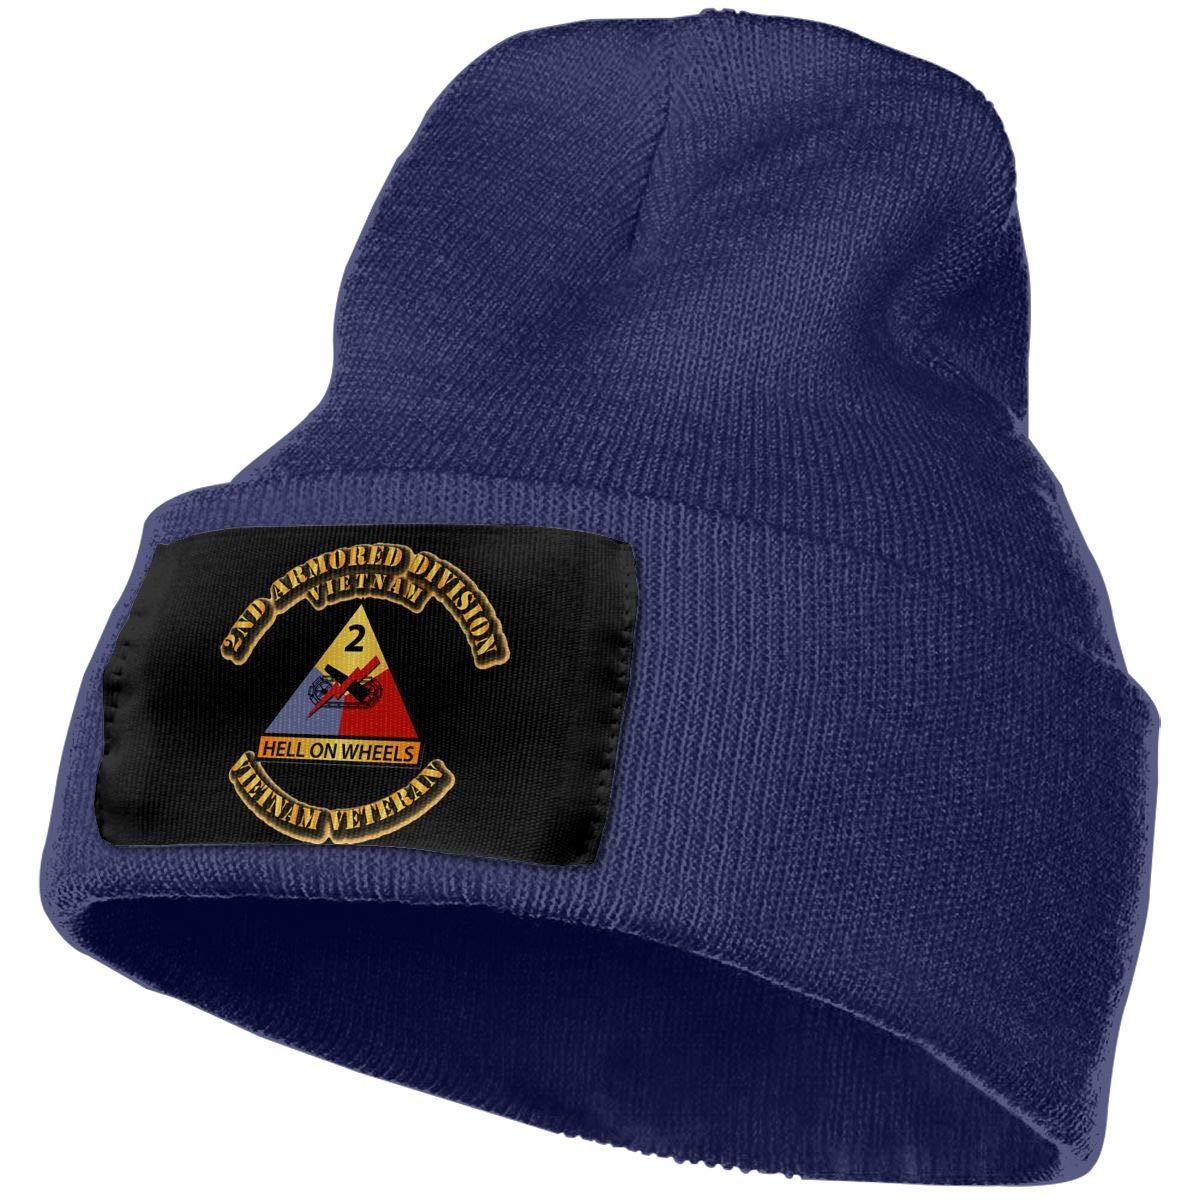 VN Veteran Men/&Women Warm Winter Knit Plain Beanie Hat Skull Cap Acrylic Knit Cuff Hat 2nd Armored Division